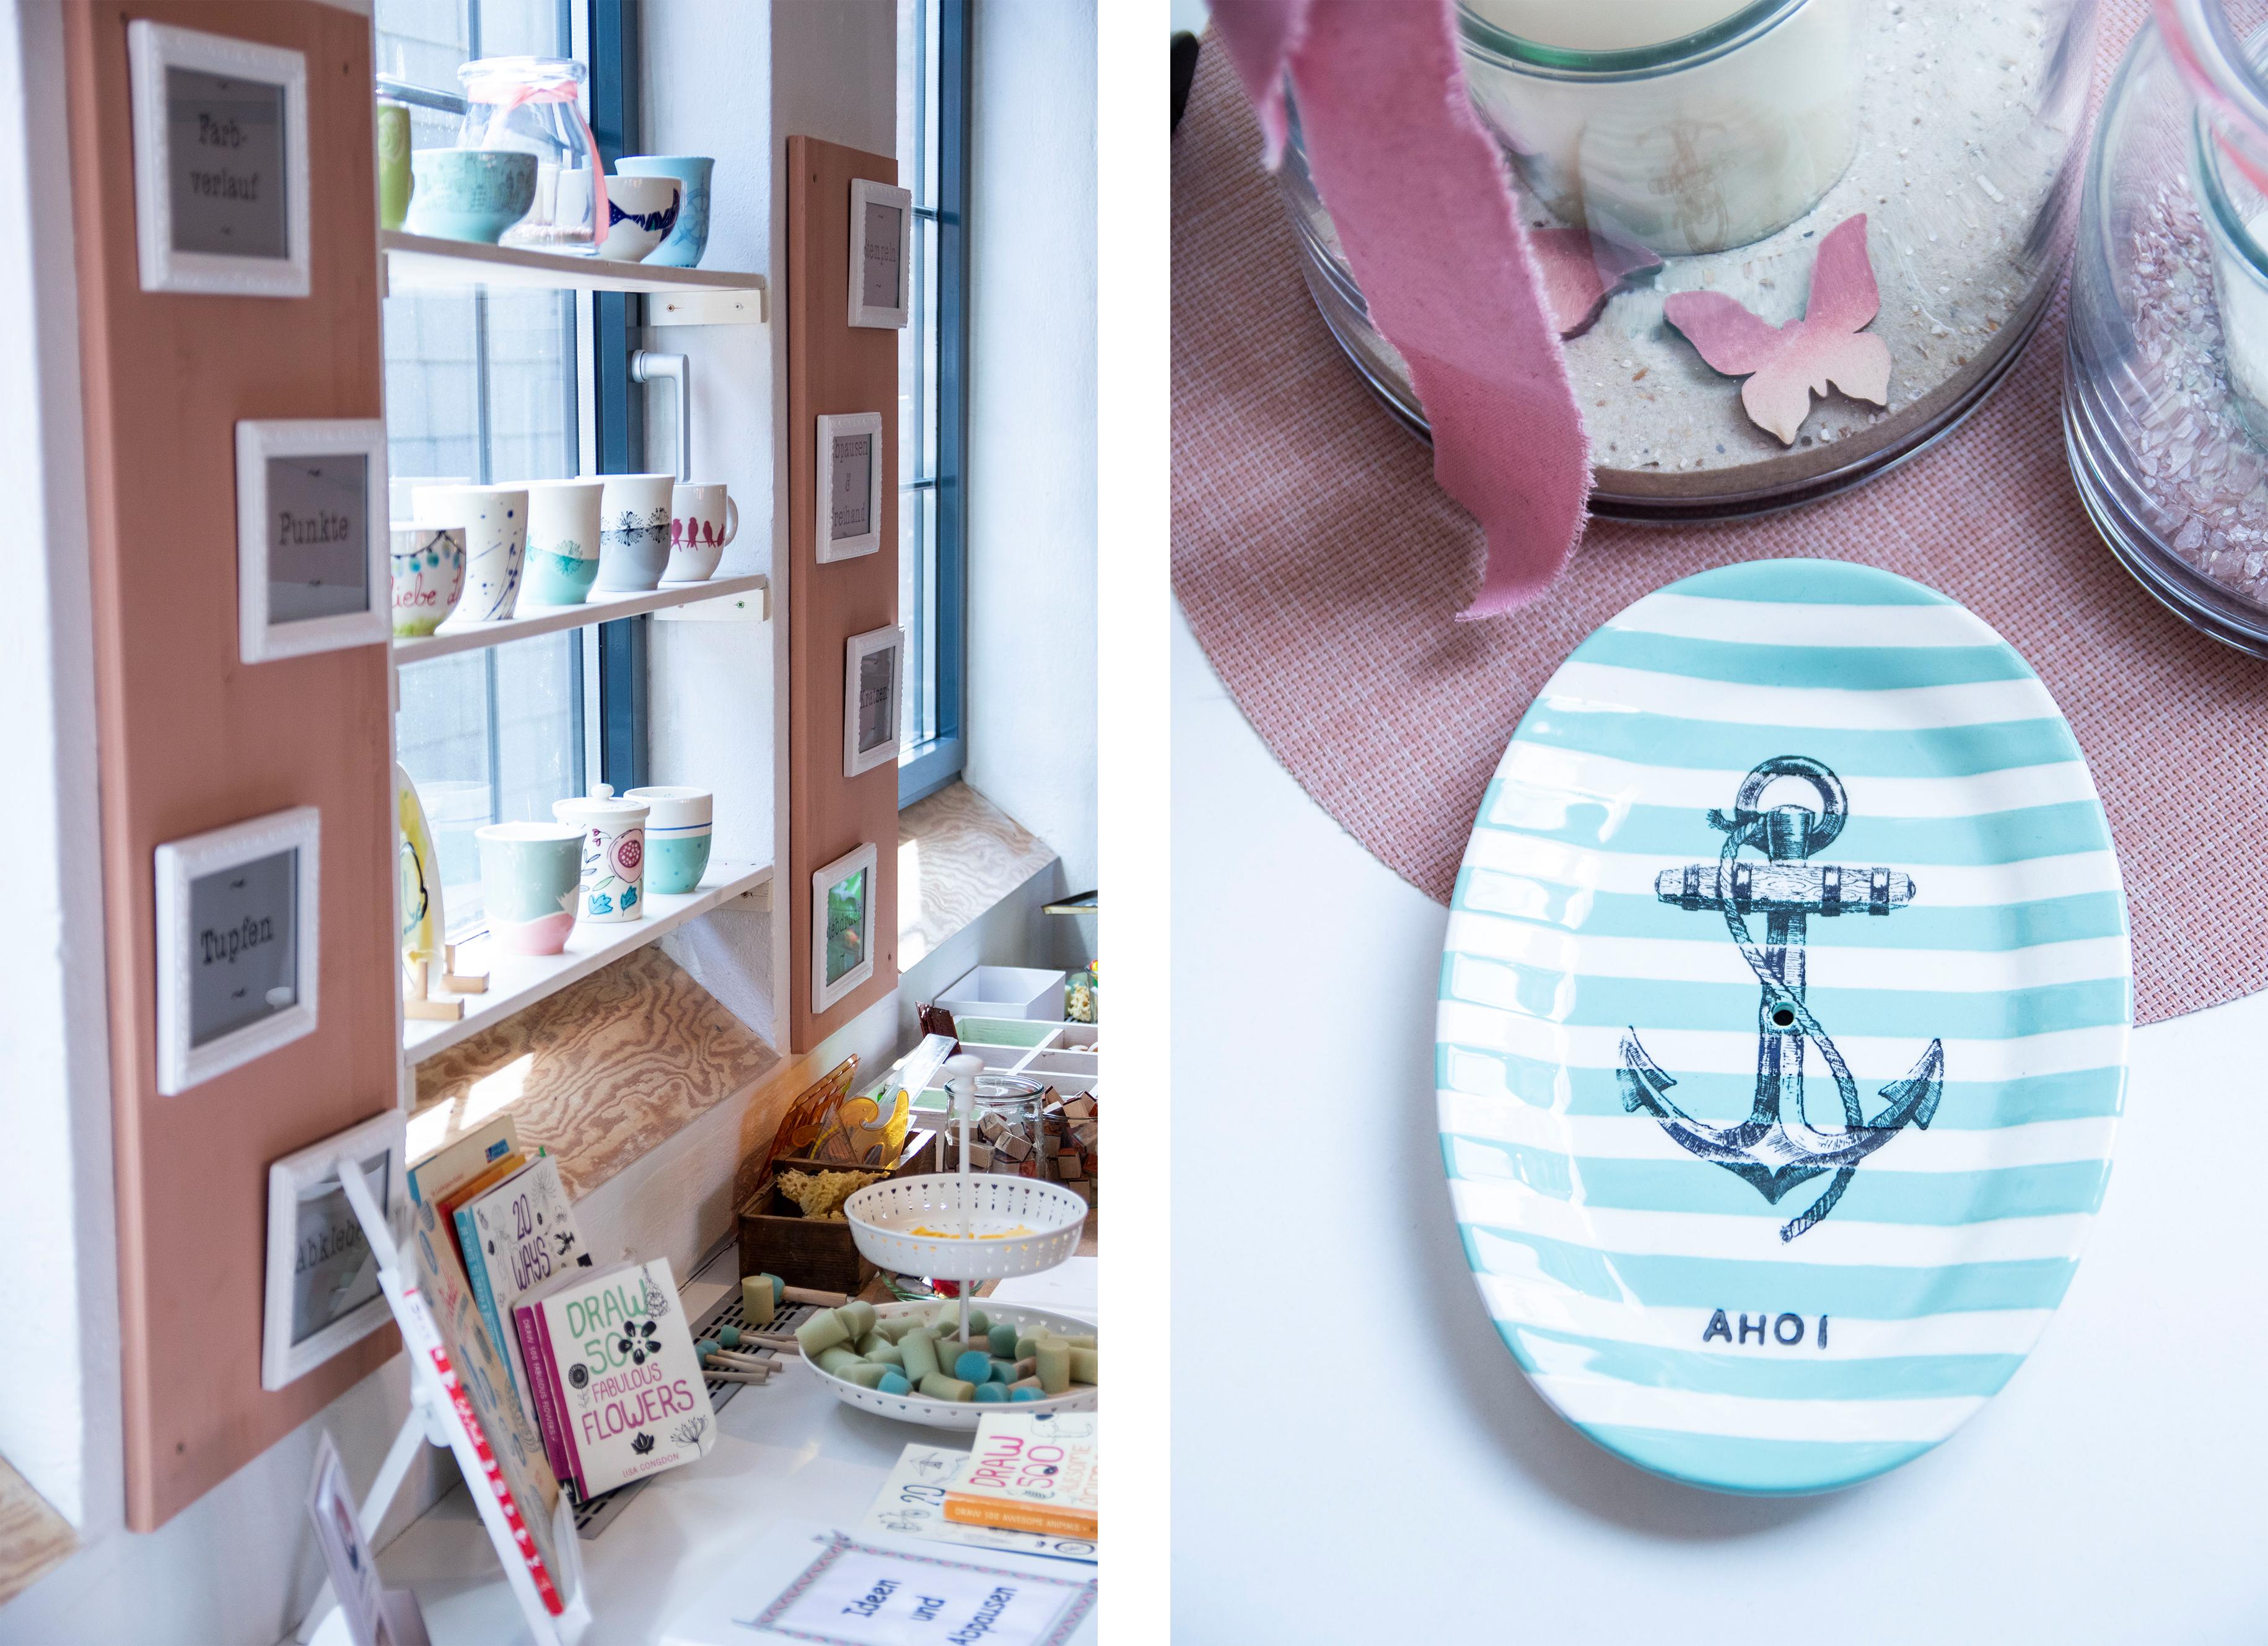 Keramik bemalen: 4 kreative und einfache Ideen